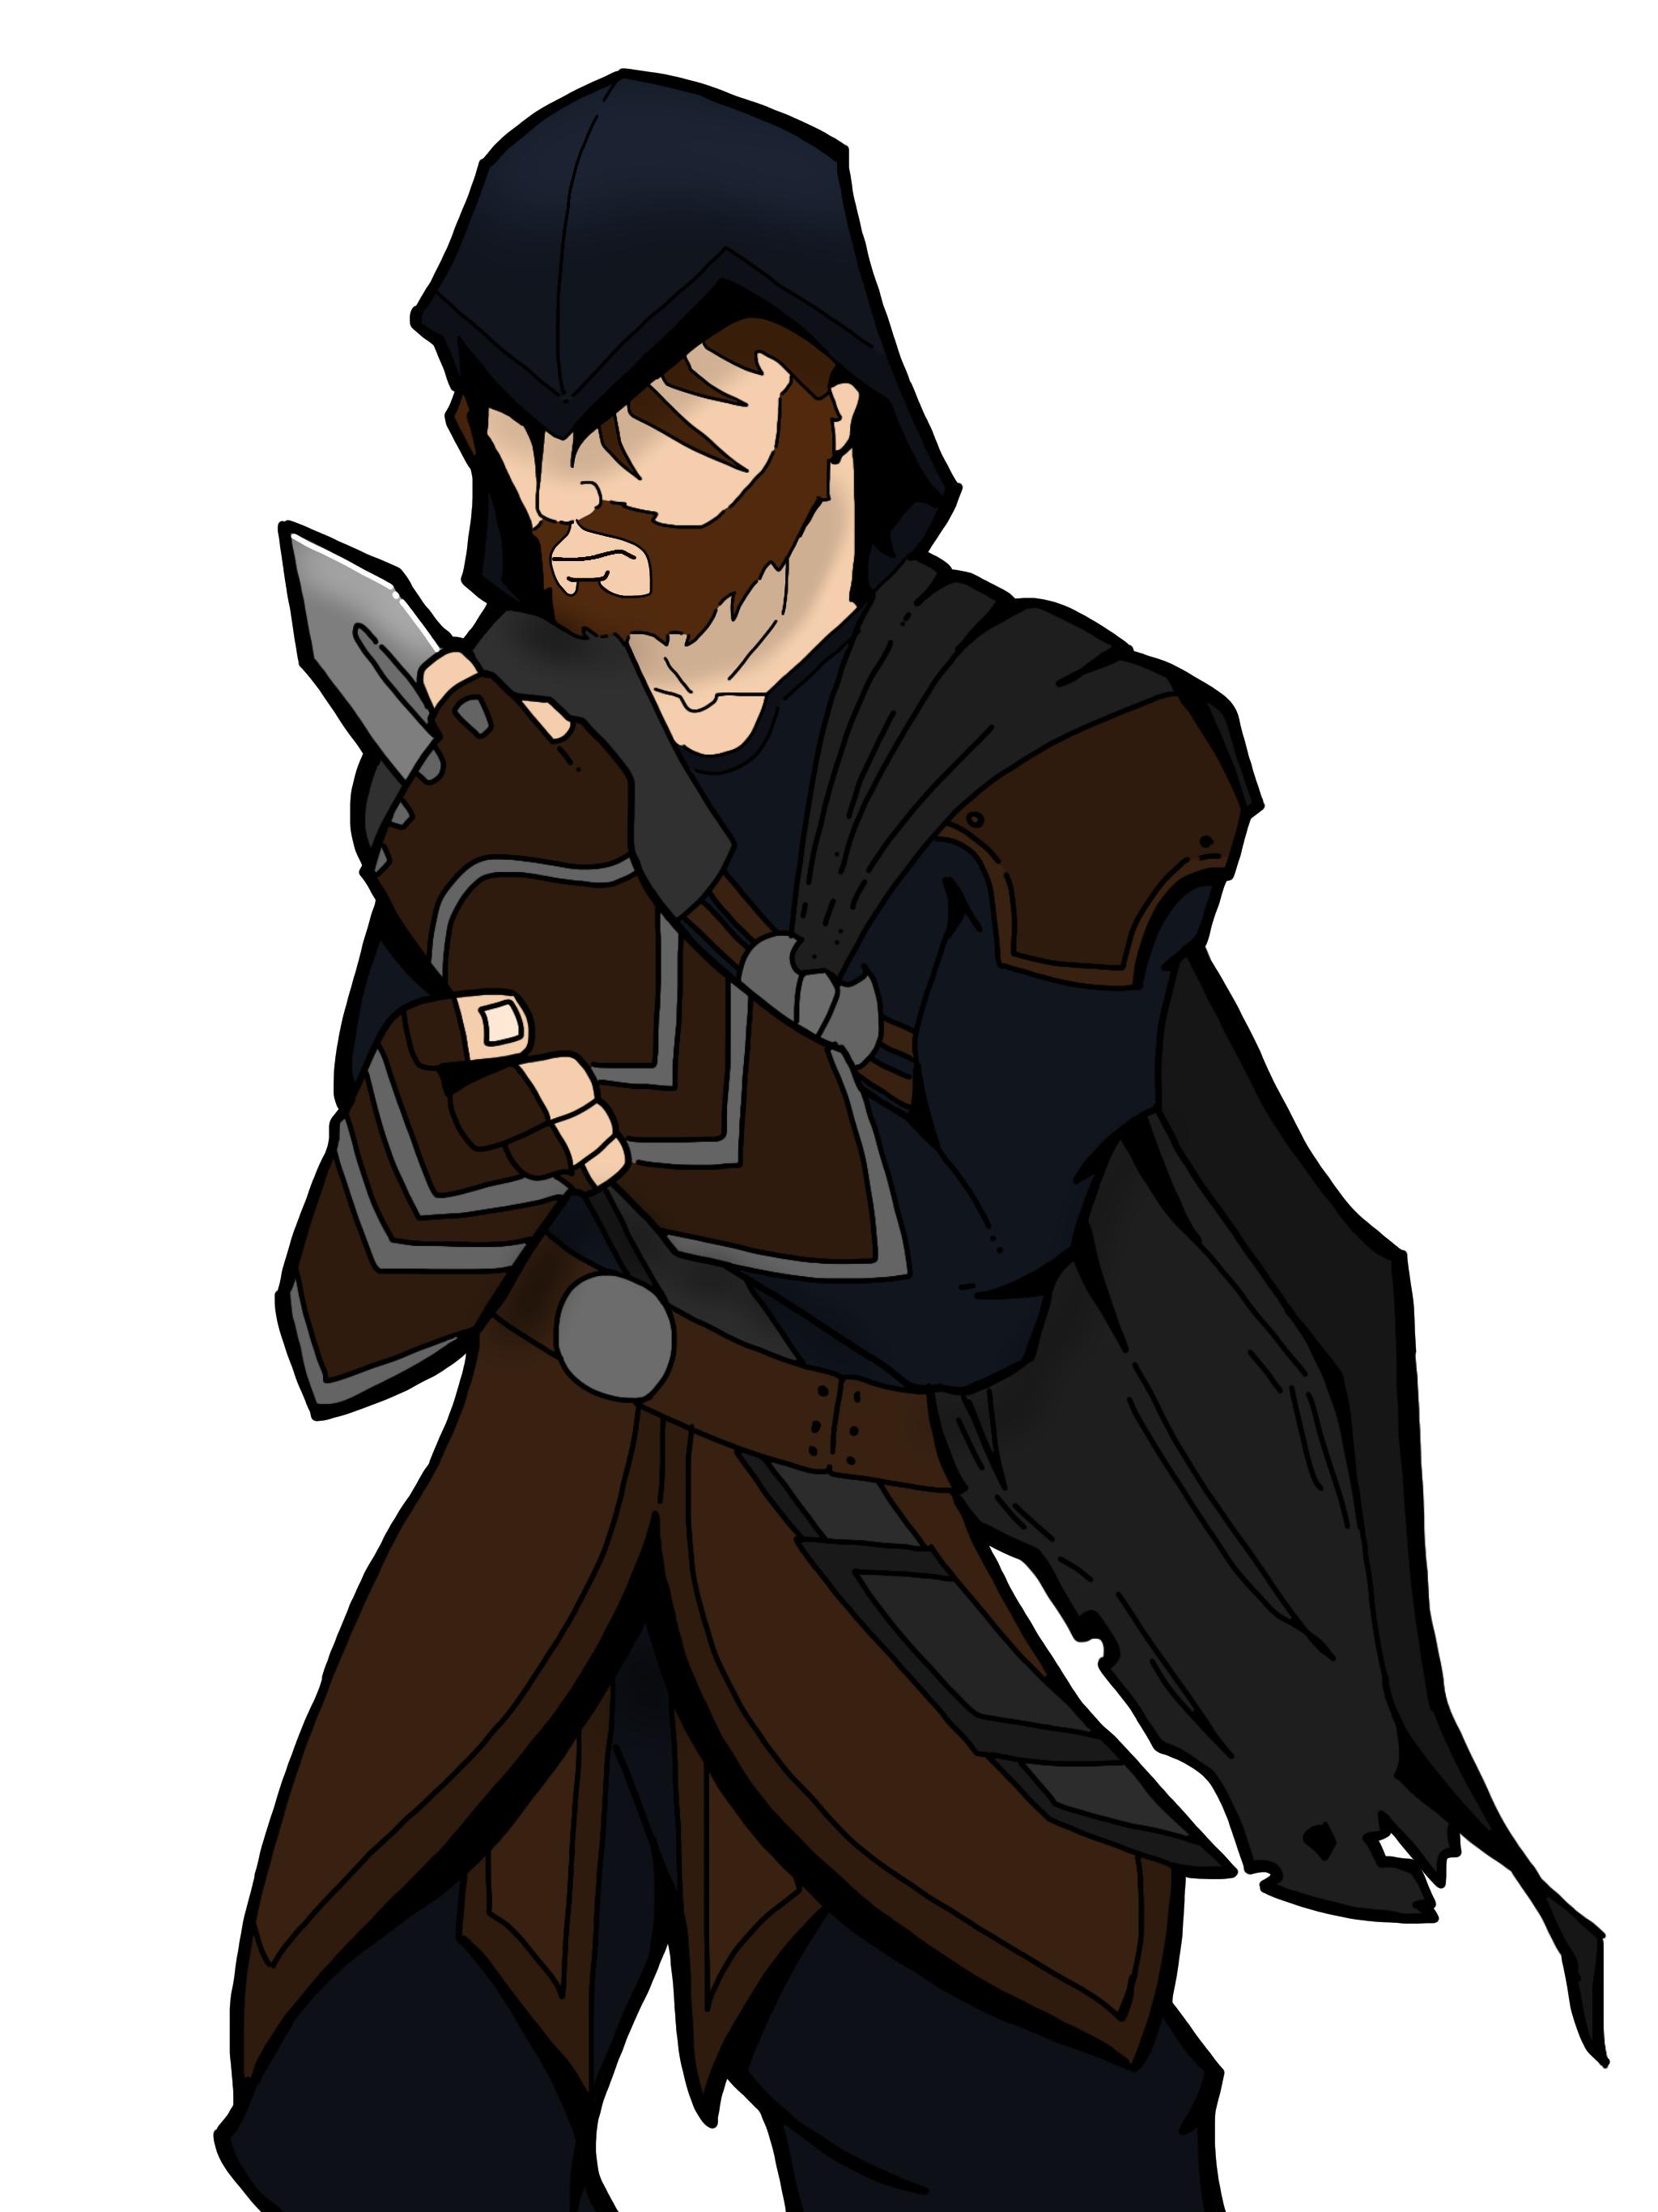 Hawk the rogue assassin (character design drawing)